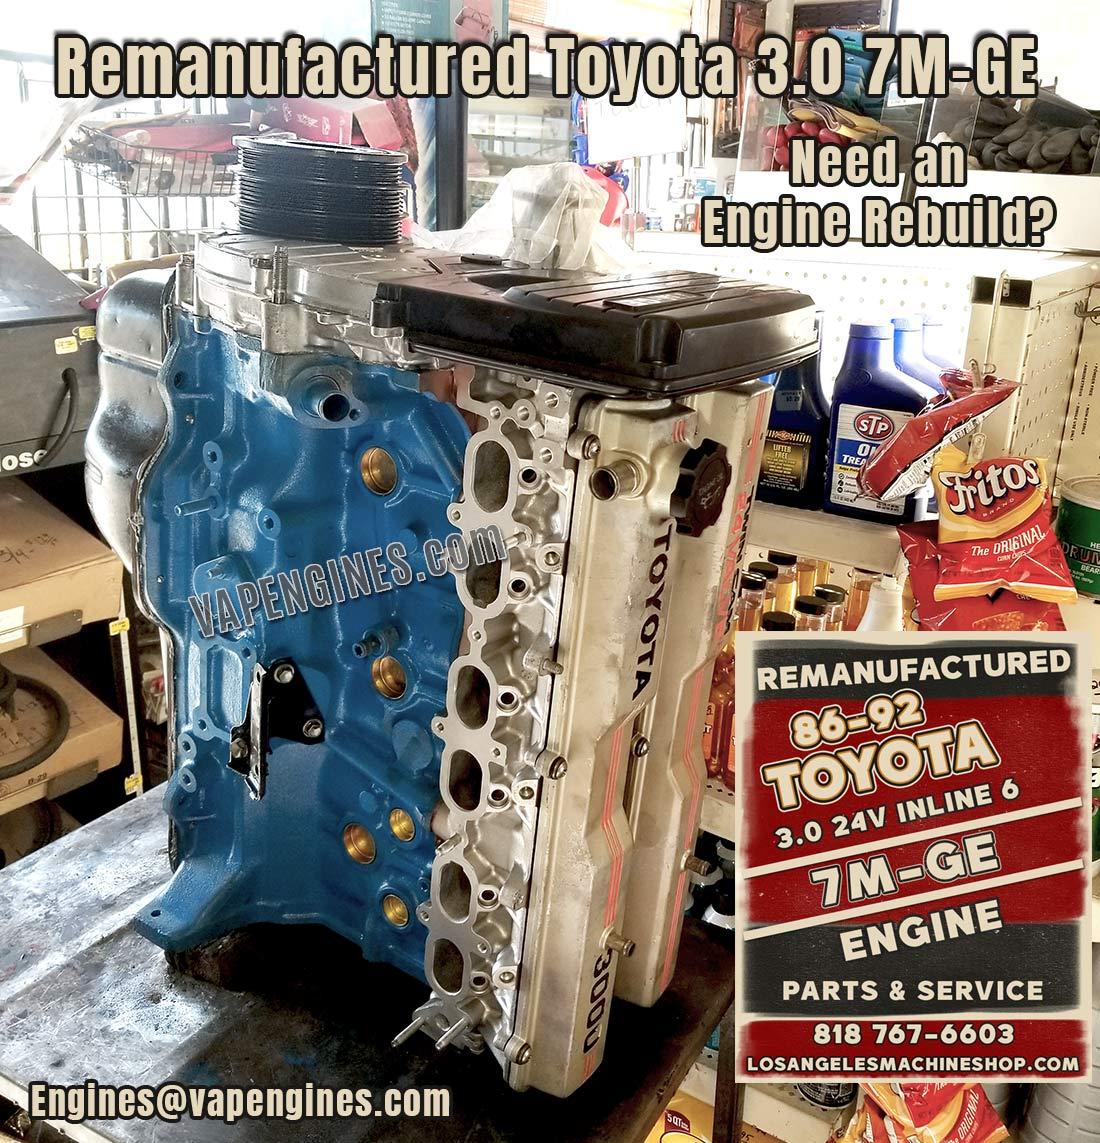 Toyota 7M-GE 3.0 L6 Remanufactured Engine